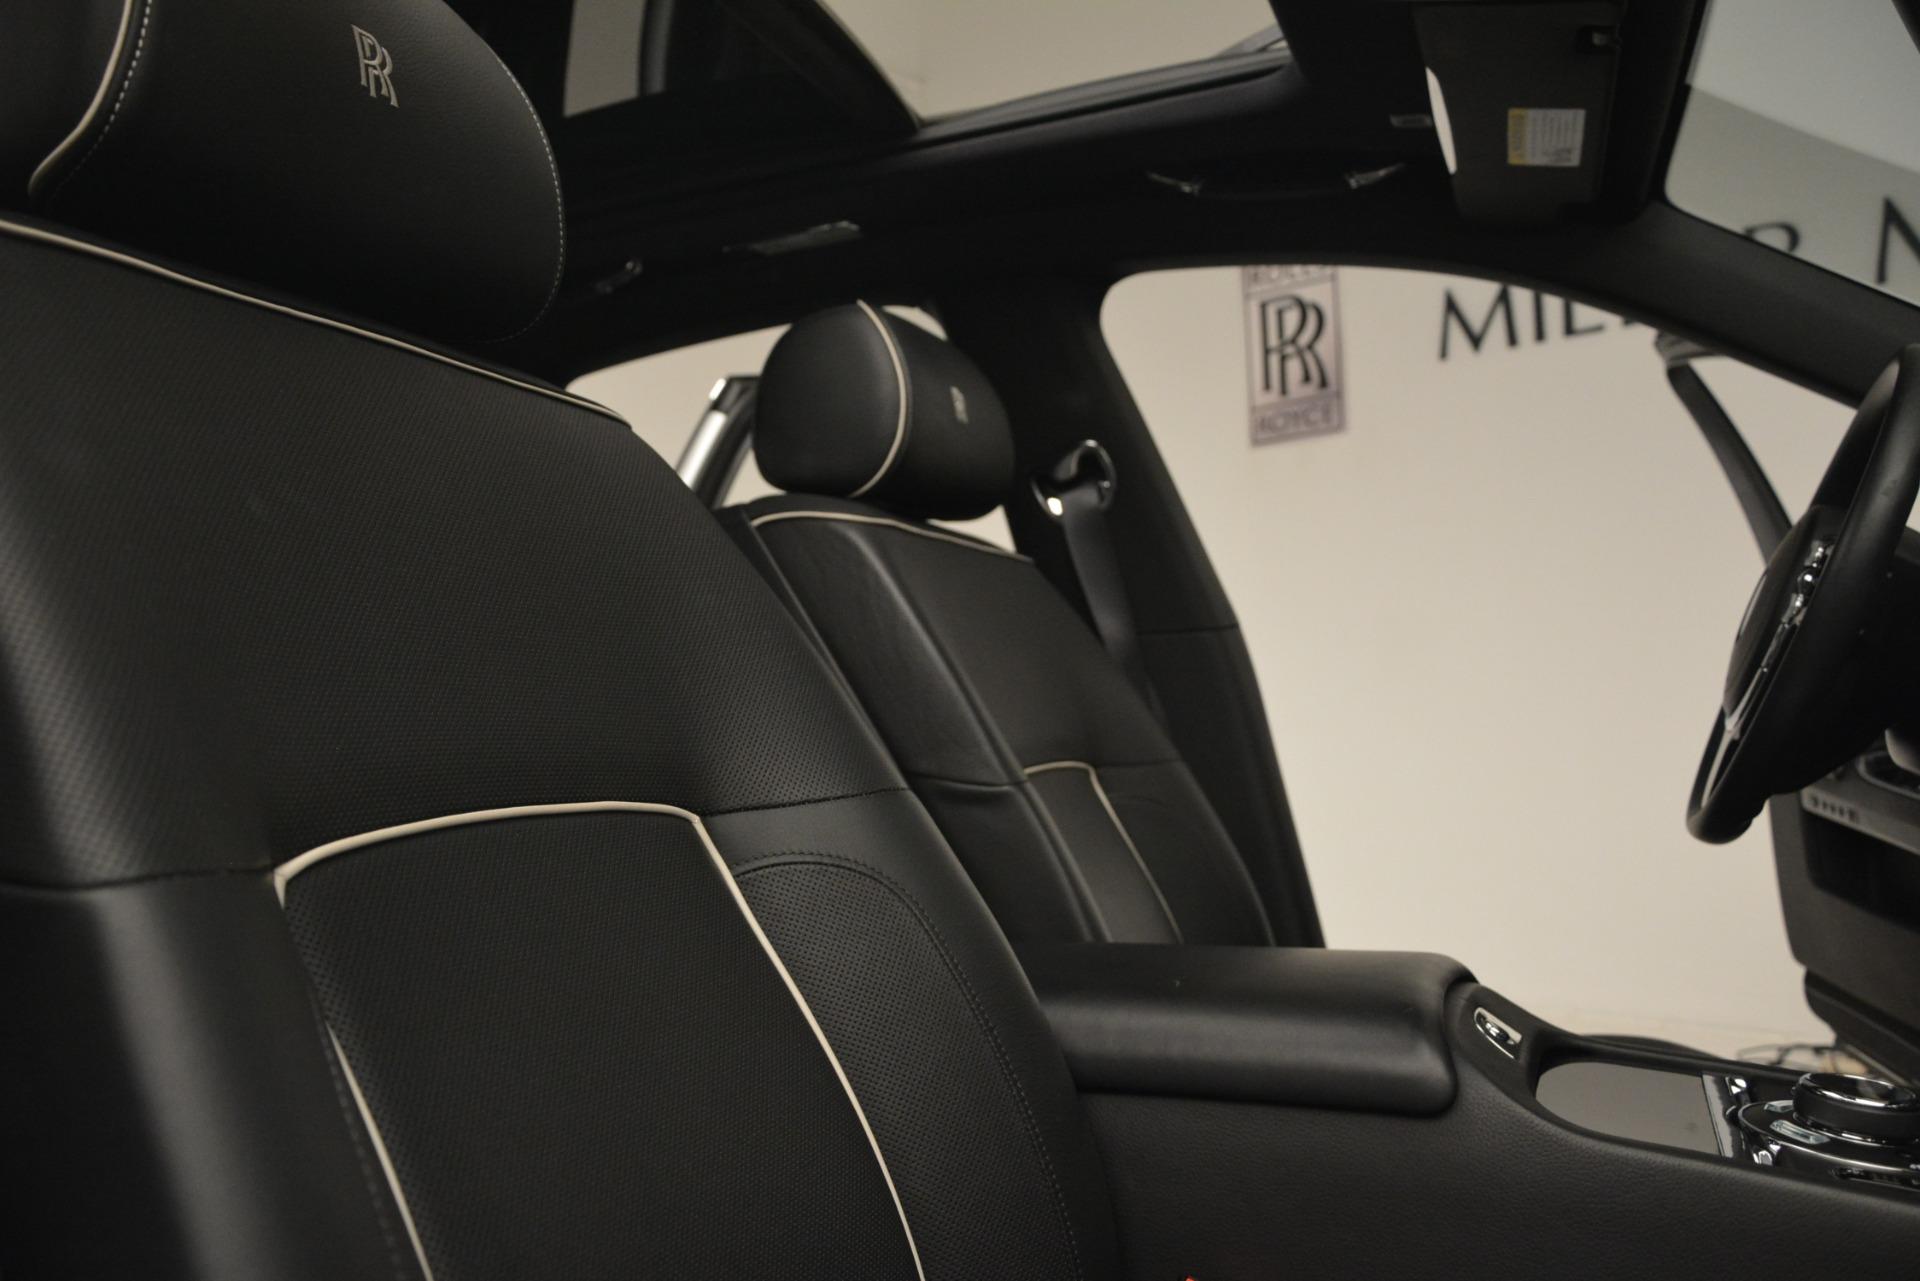 Used 2014 Rolls-Royce Ghost V-Spec For Sale In Westport, CT 2989_p24